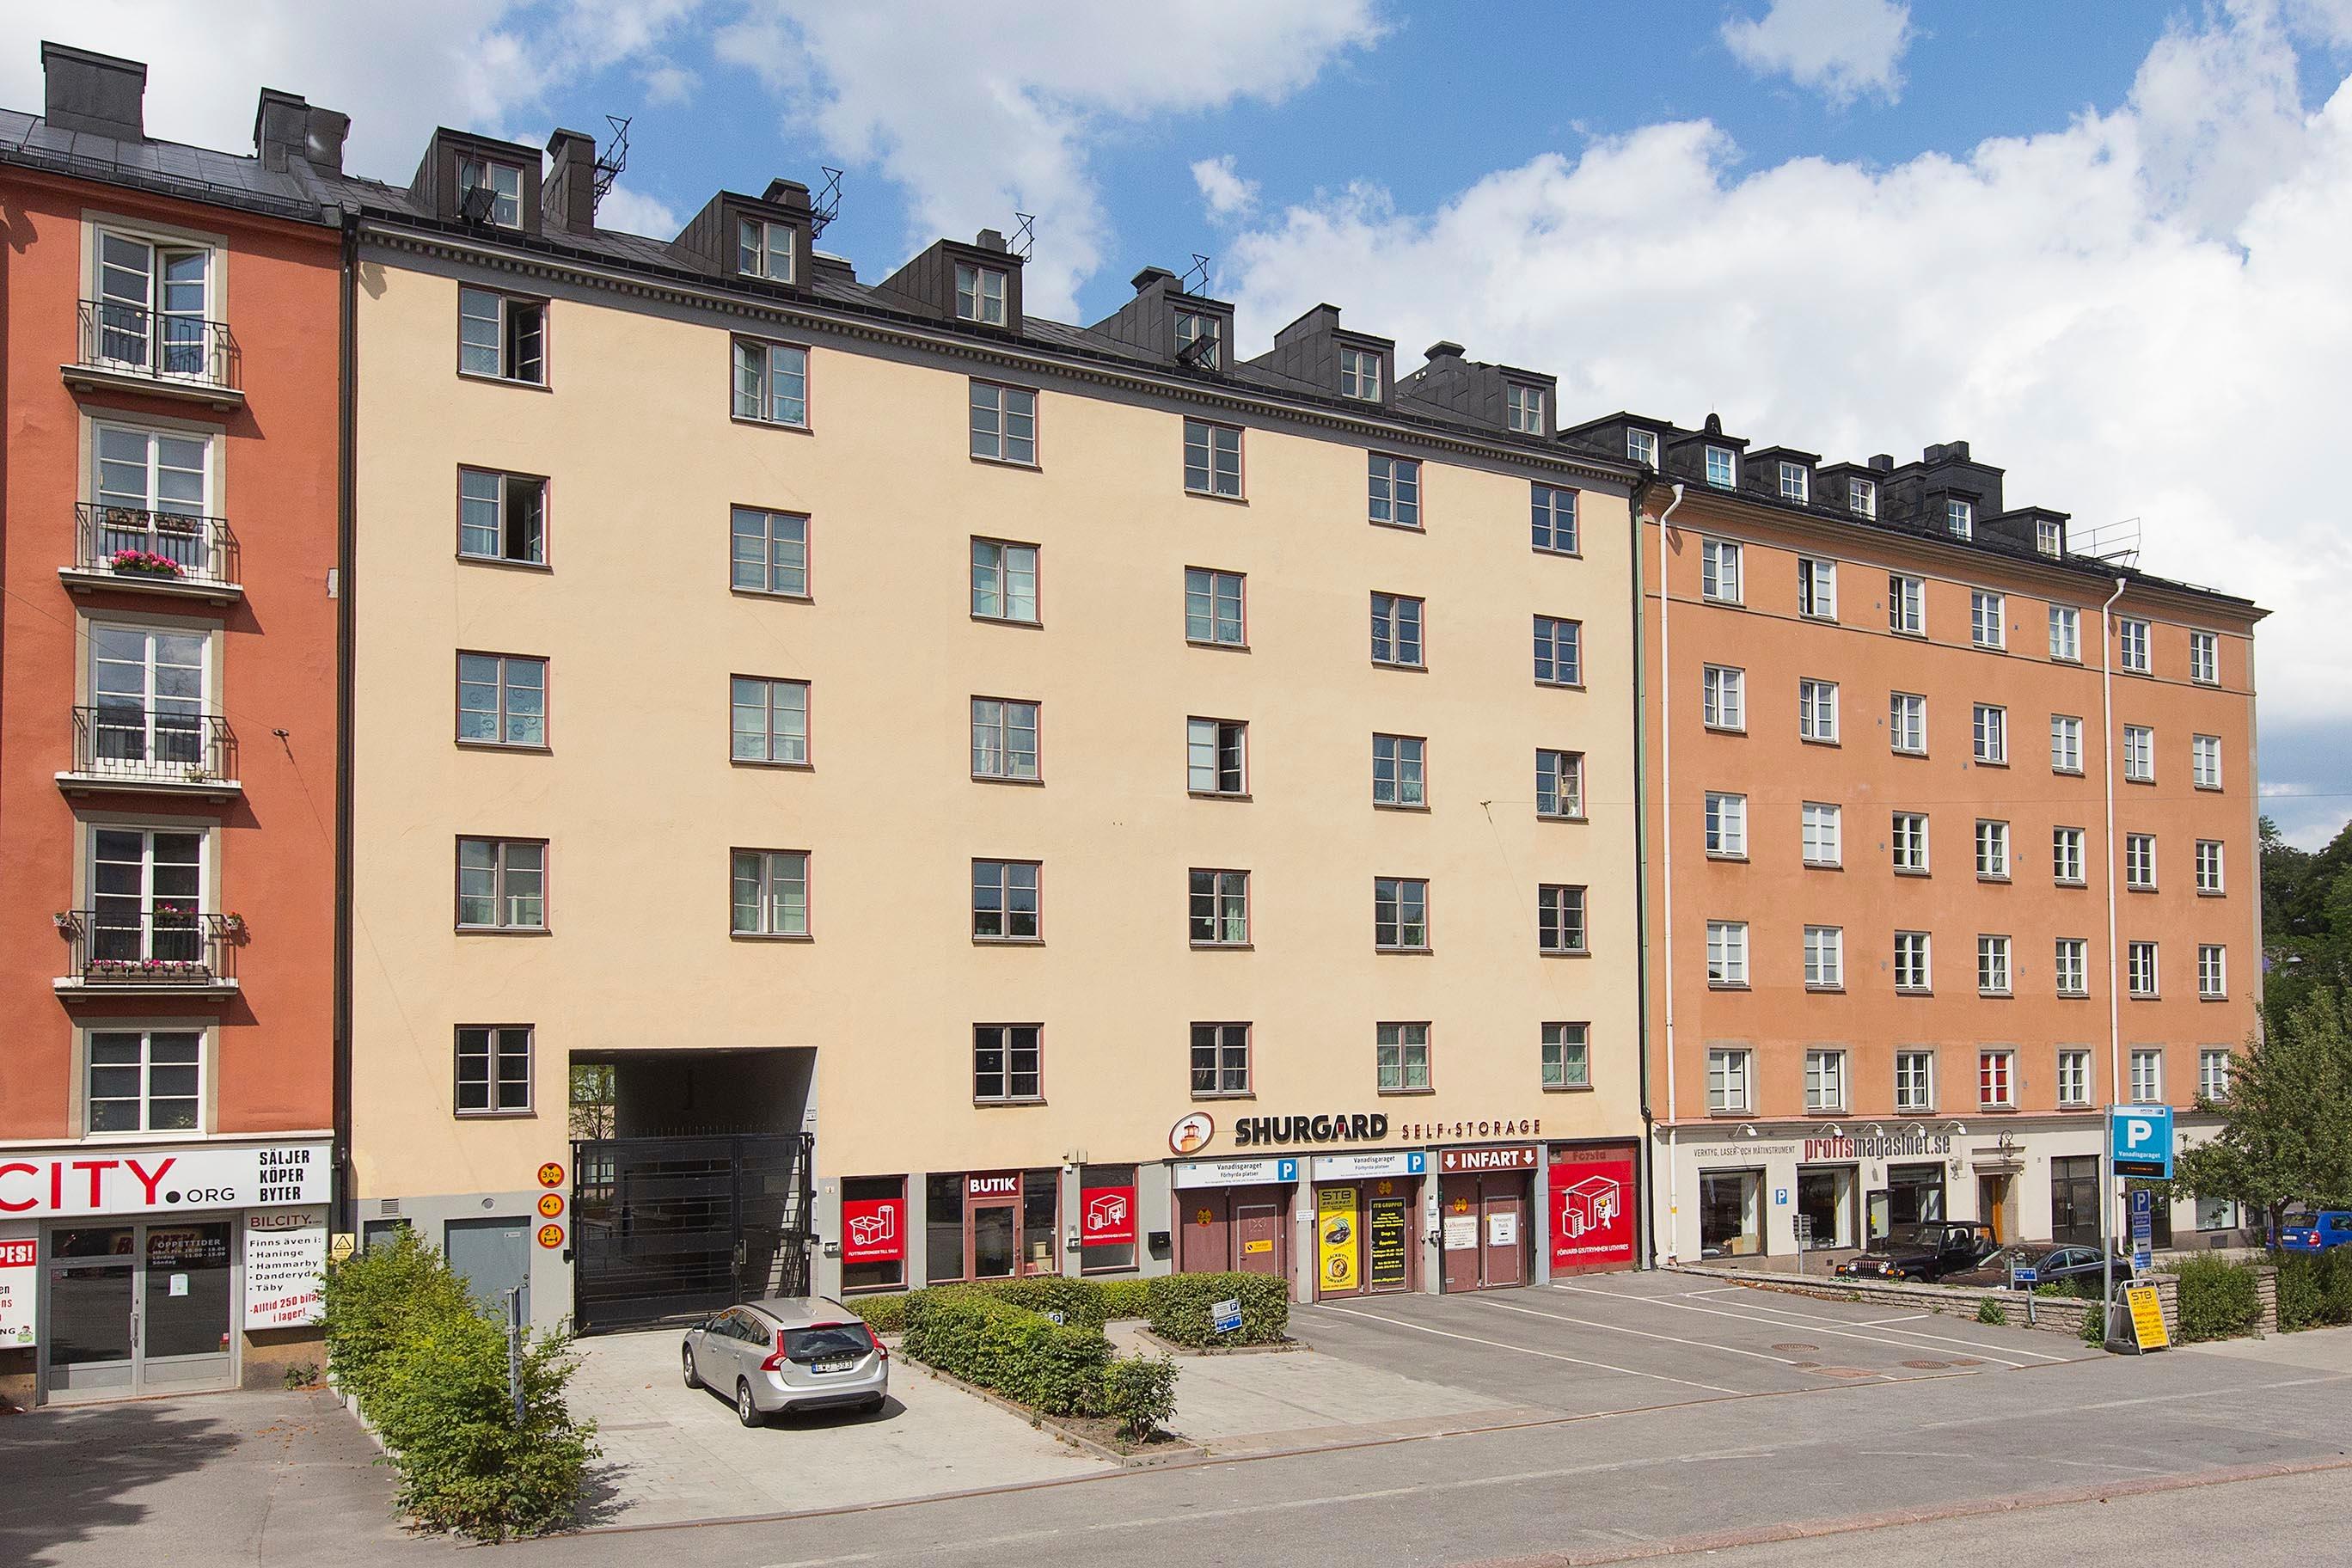 Shurgard Self-Storage Stockholm Vanadis